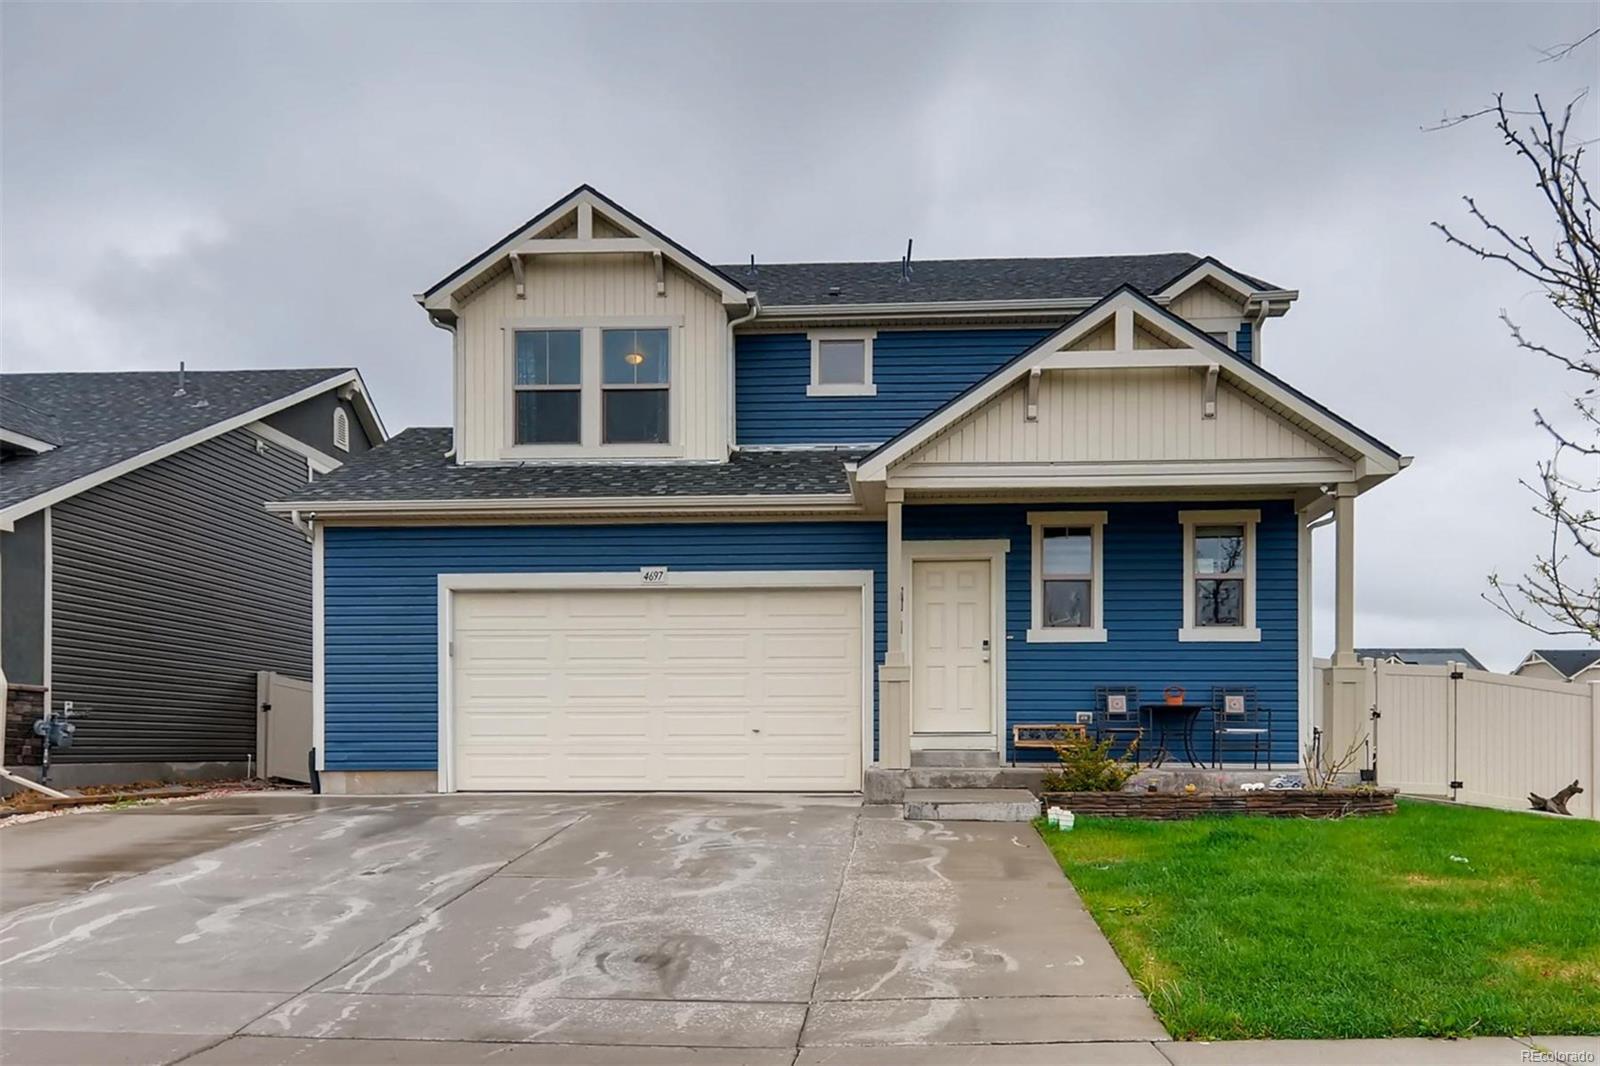 Peachy 4697 Walden Way Denver Co 80249 Mls 8859279 Coldwell Banker Home Interior And Landscaping Ologienasavecom